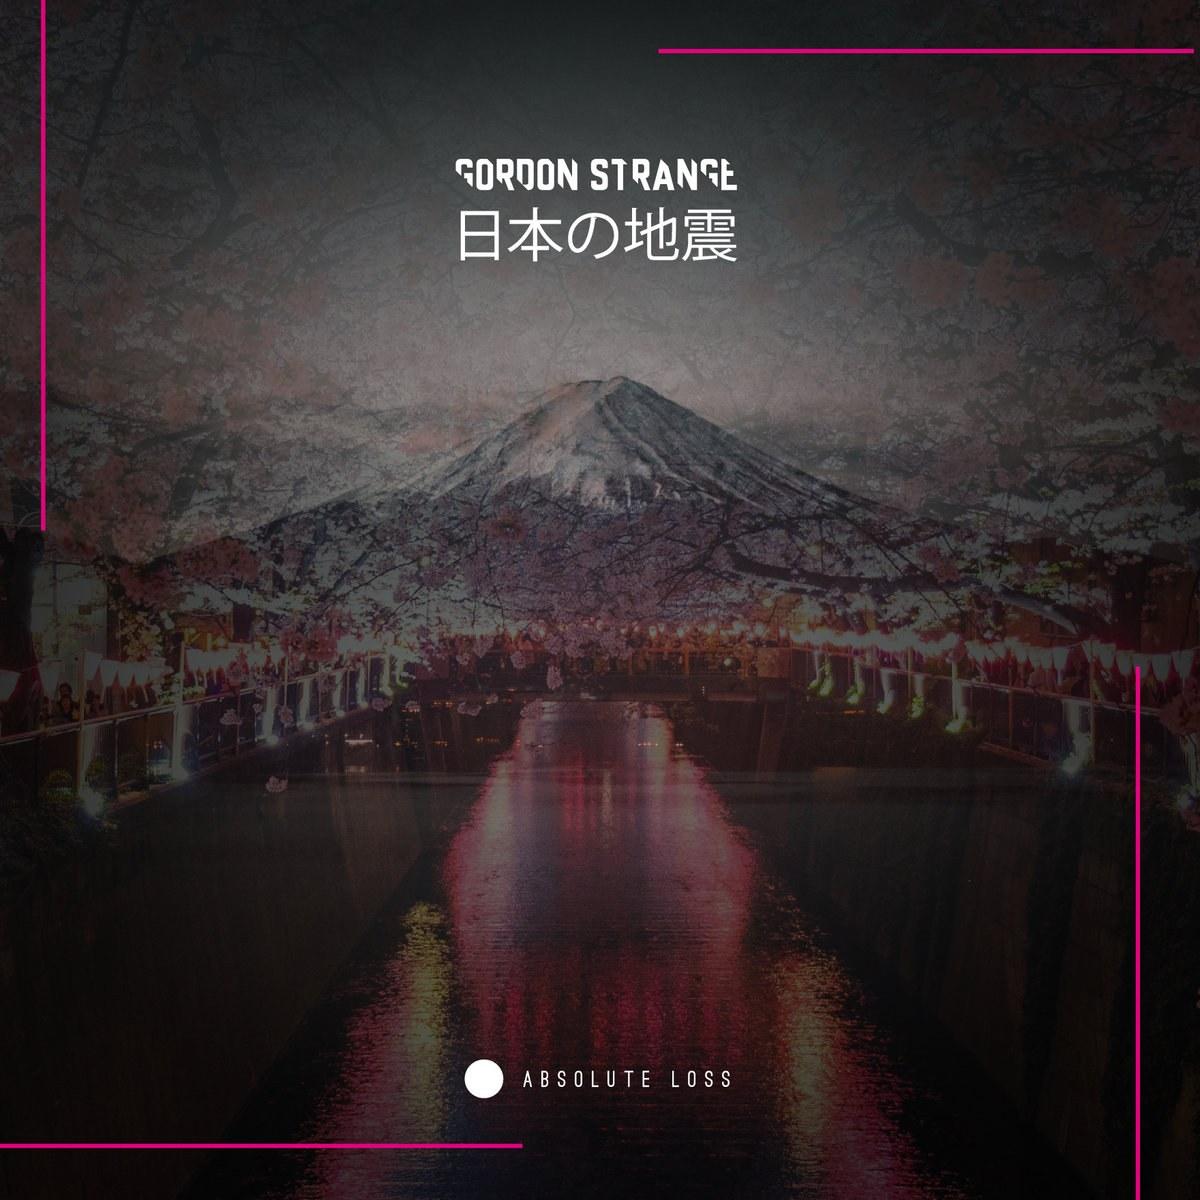 Gordon Strange - Earthquakes In Japan